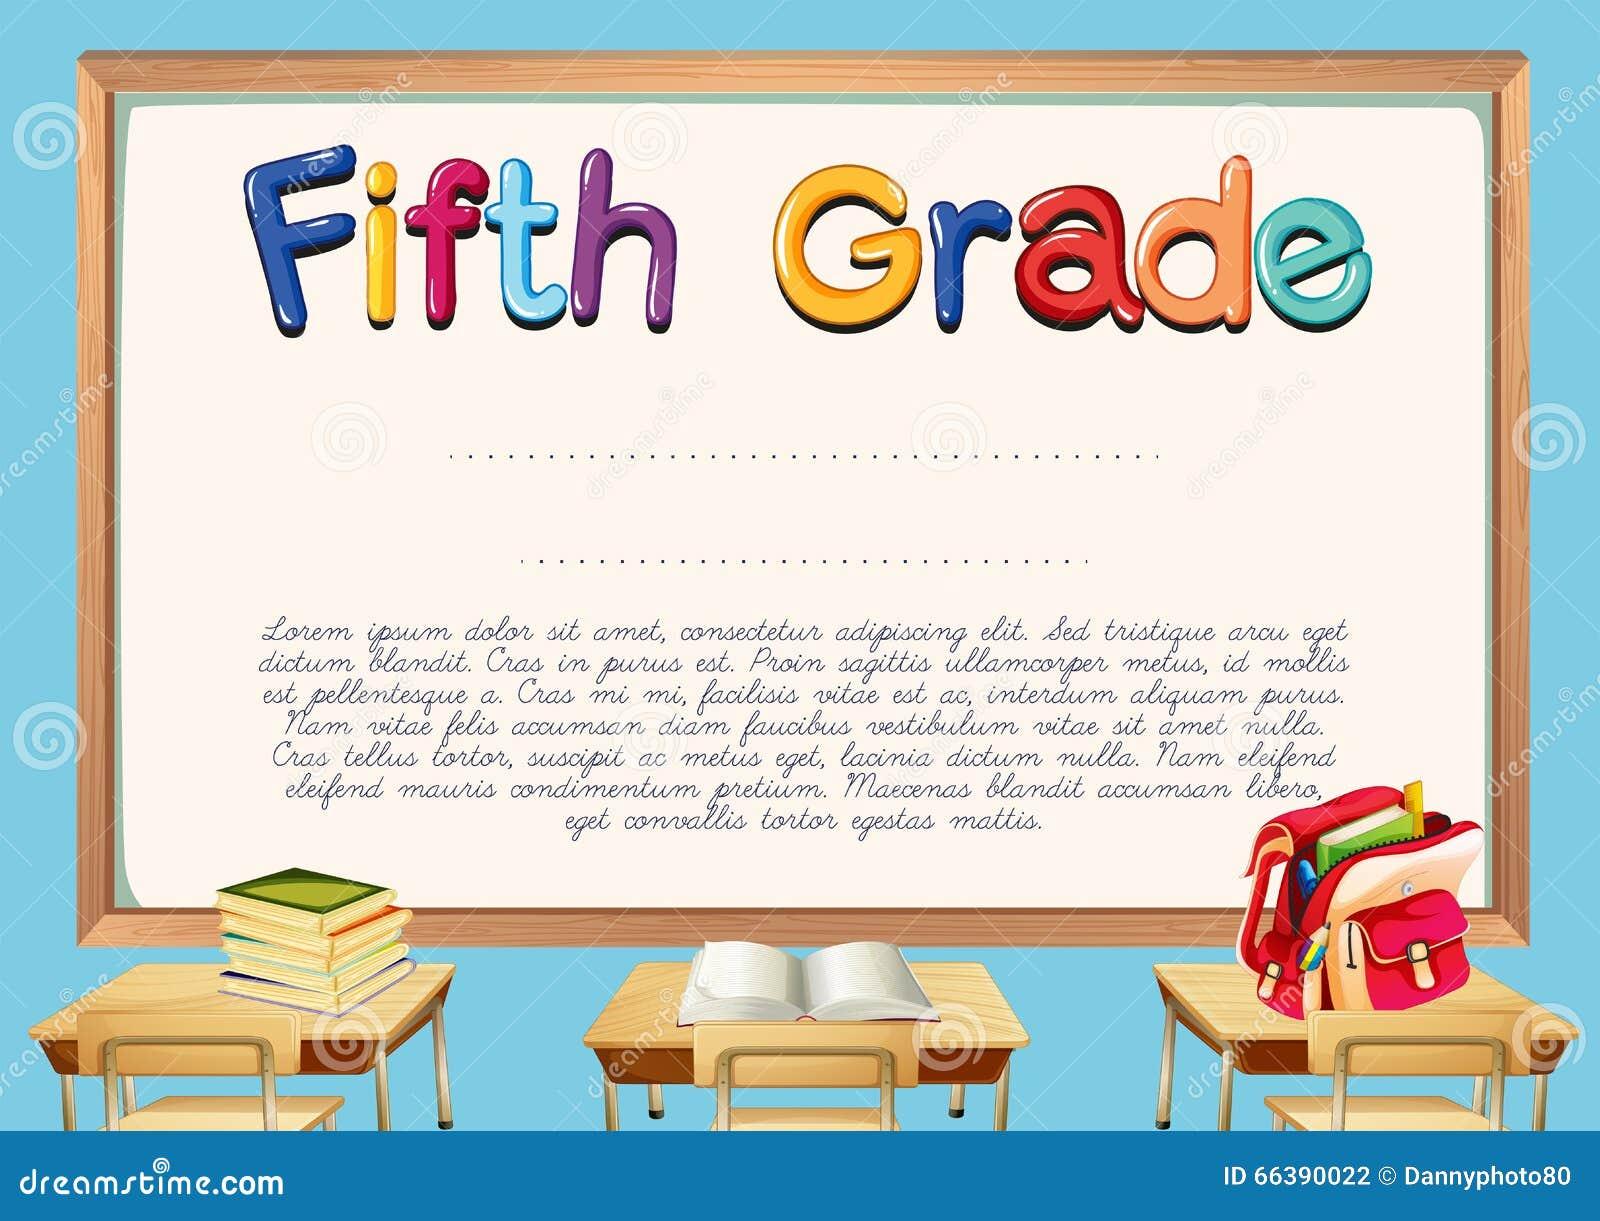 5th grade graduation certificate template 28 images